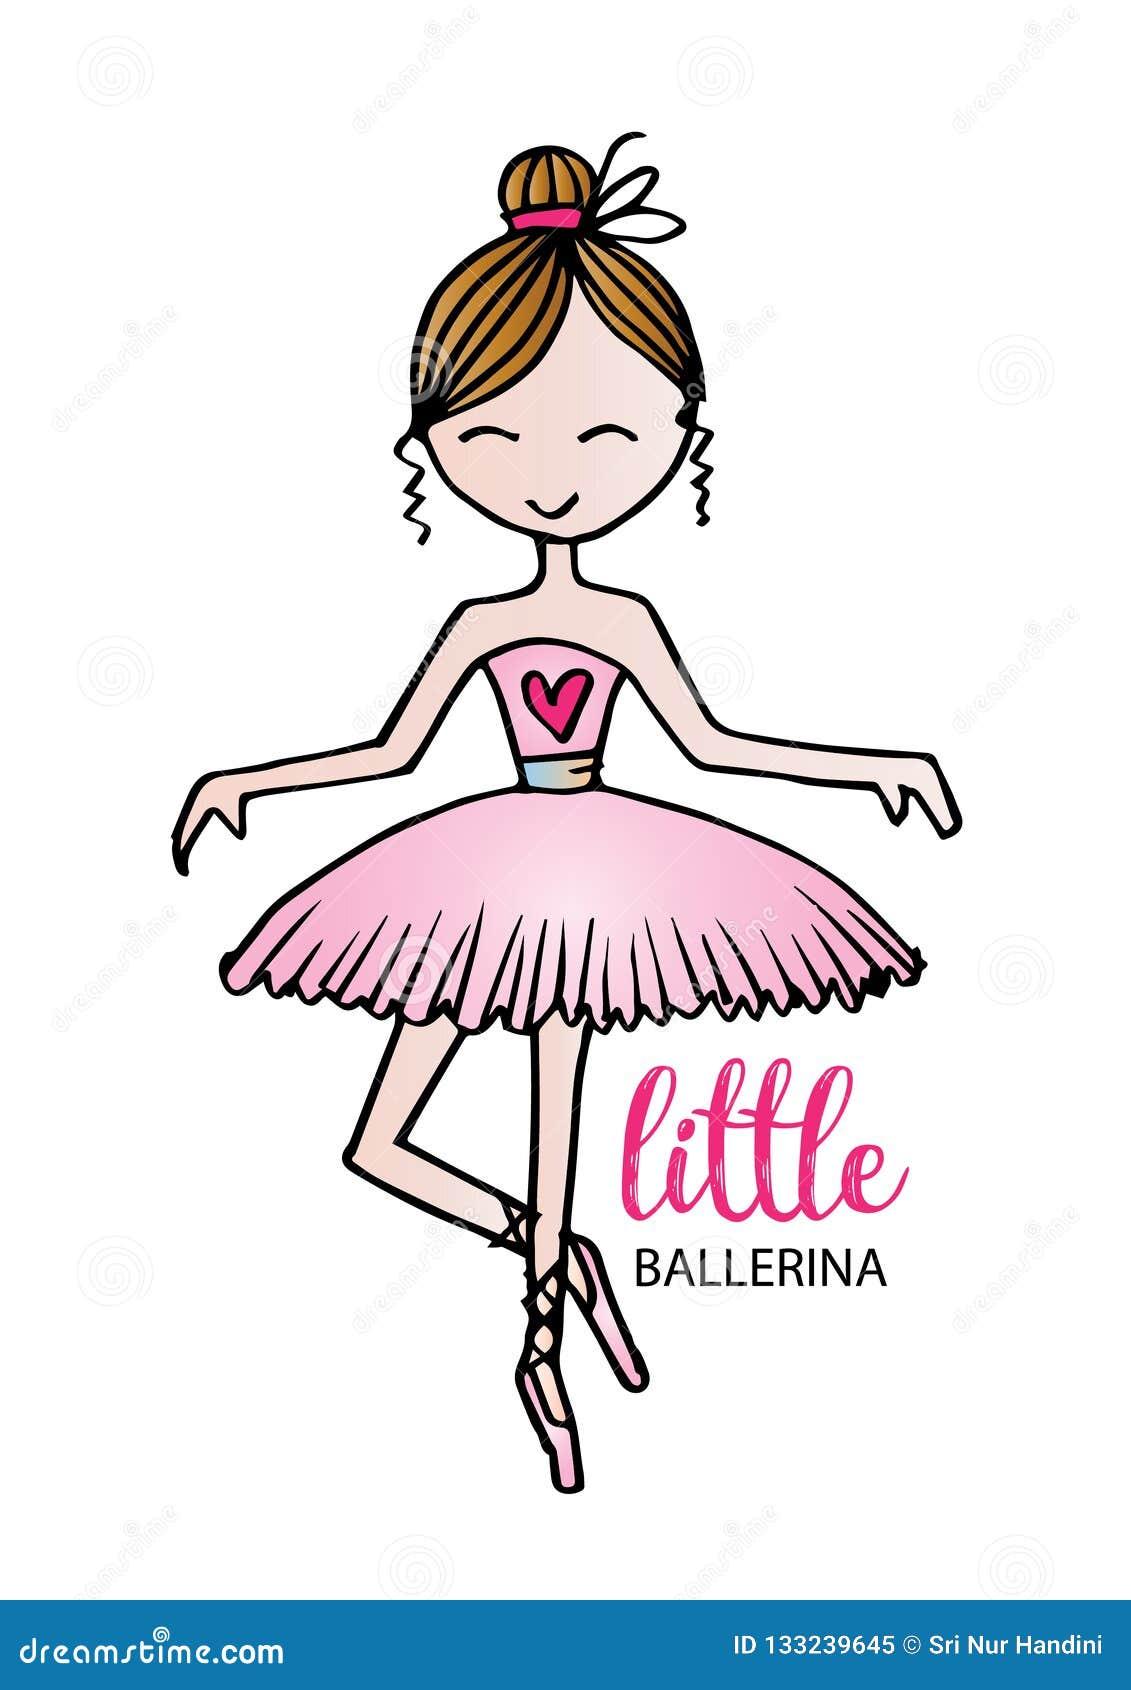 Little Ballerina Cute Cartoon Girl For Clothing Stock Vector Illustration Of Design Baby 133239645